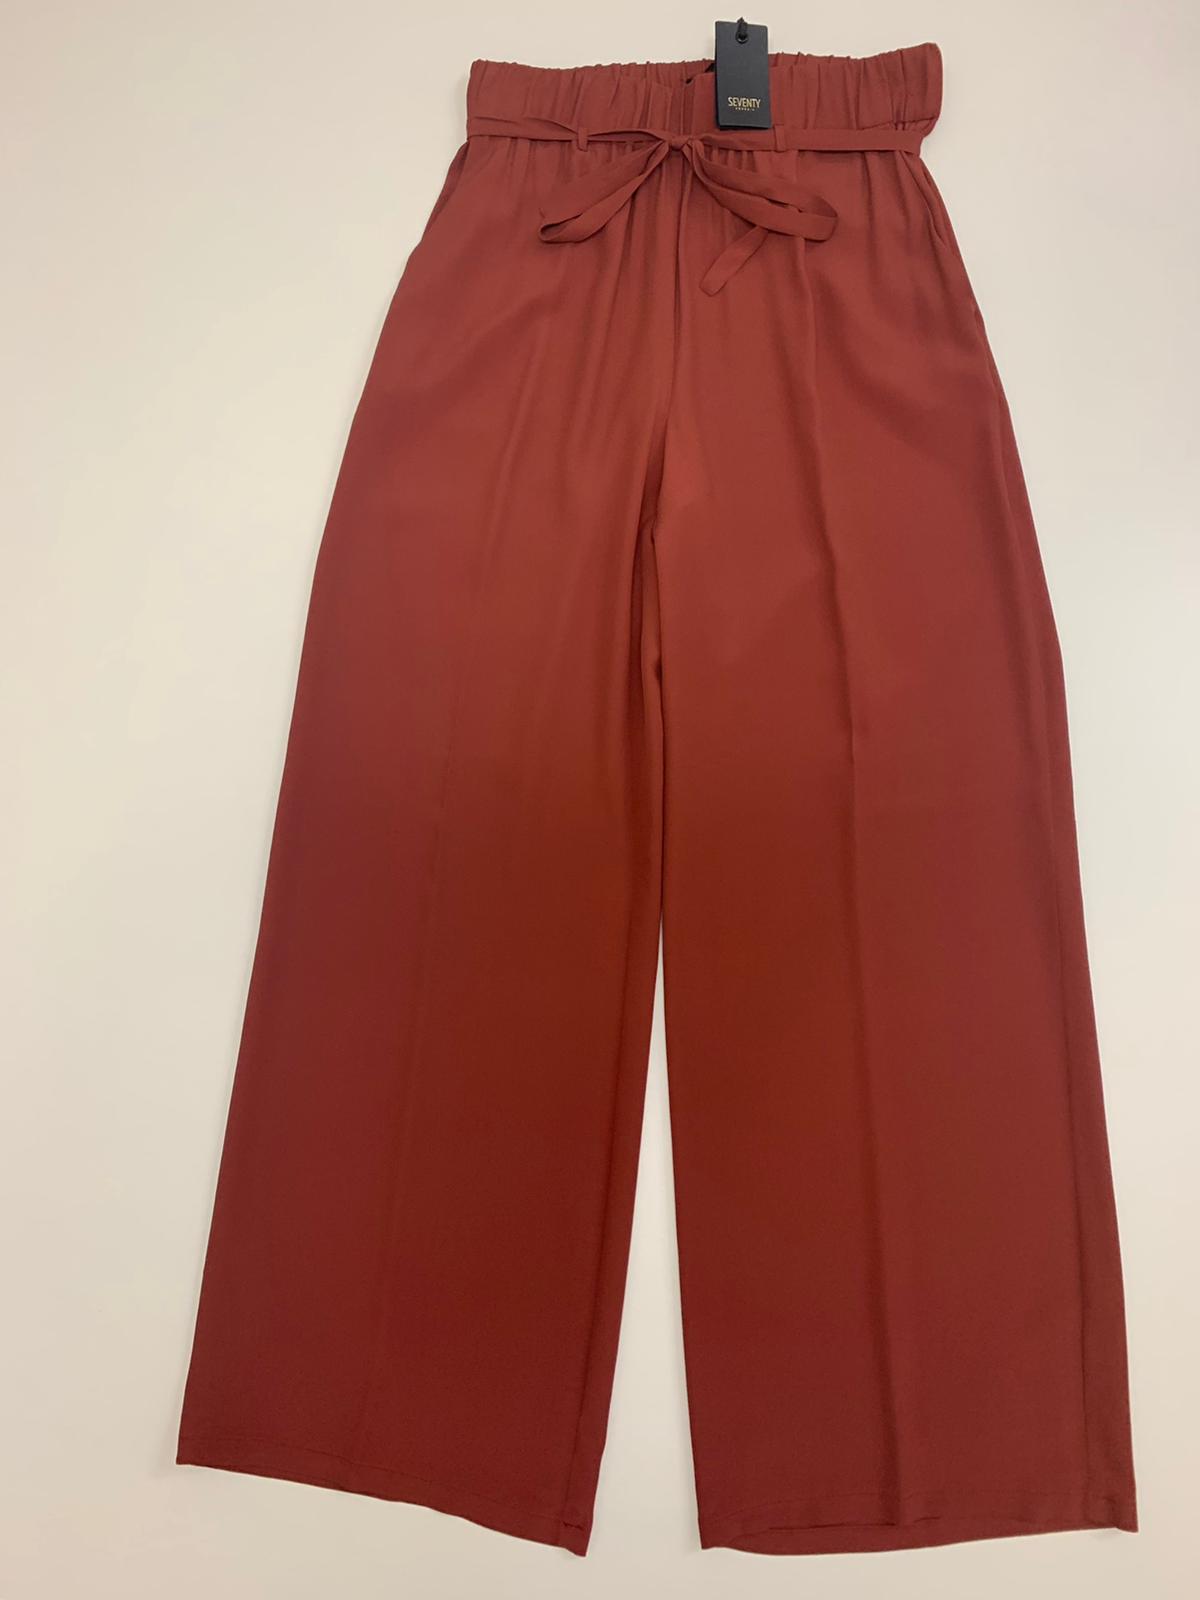 Pantalone Seventy Crepe Rossa